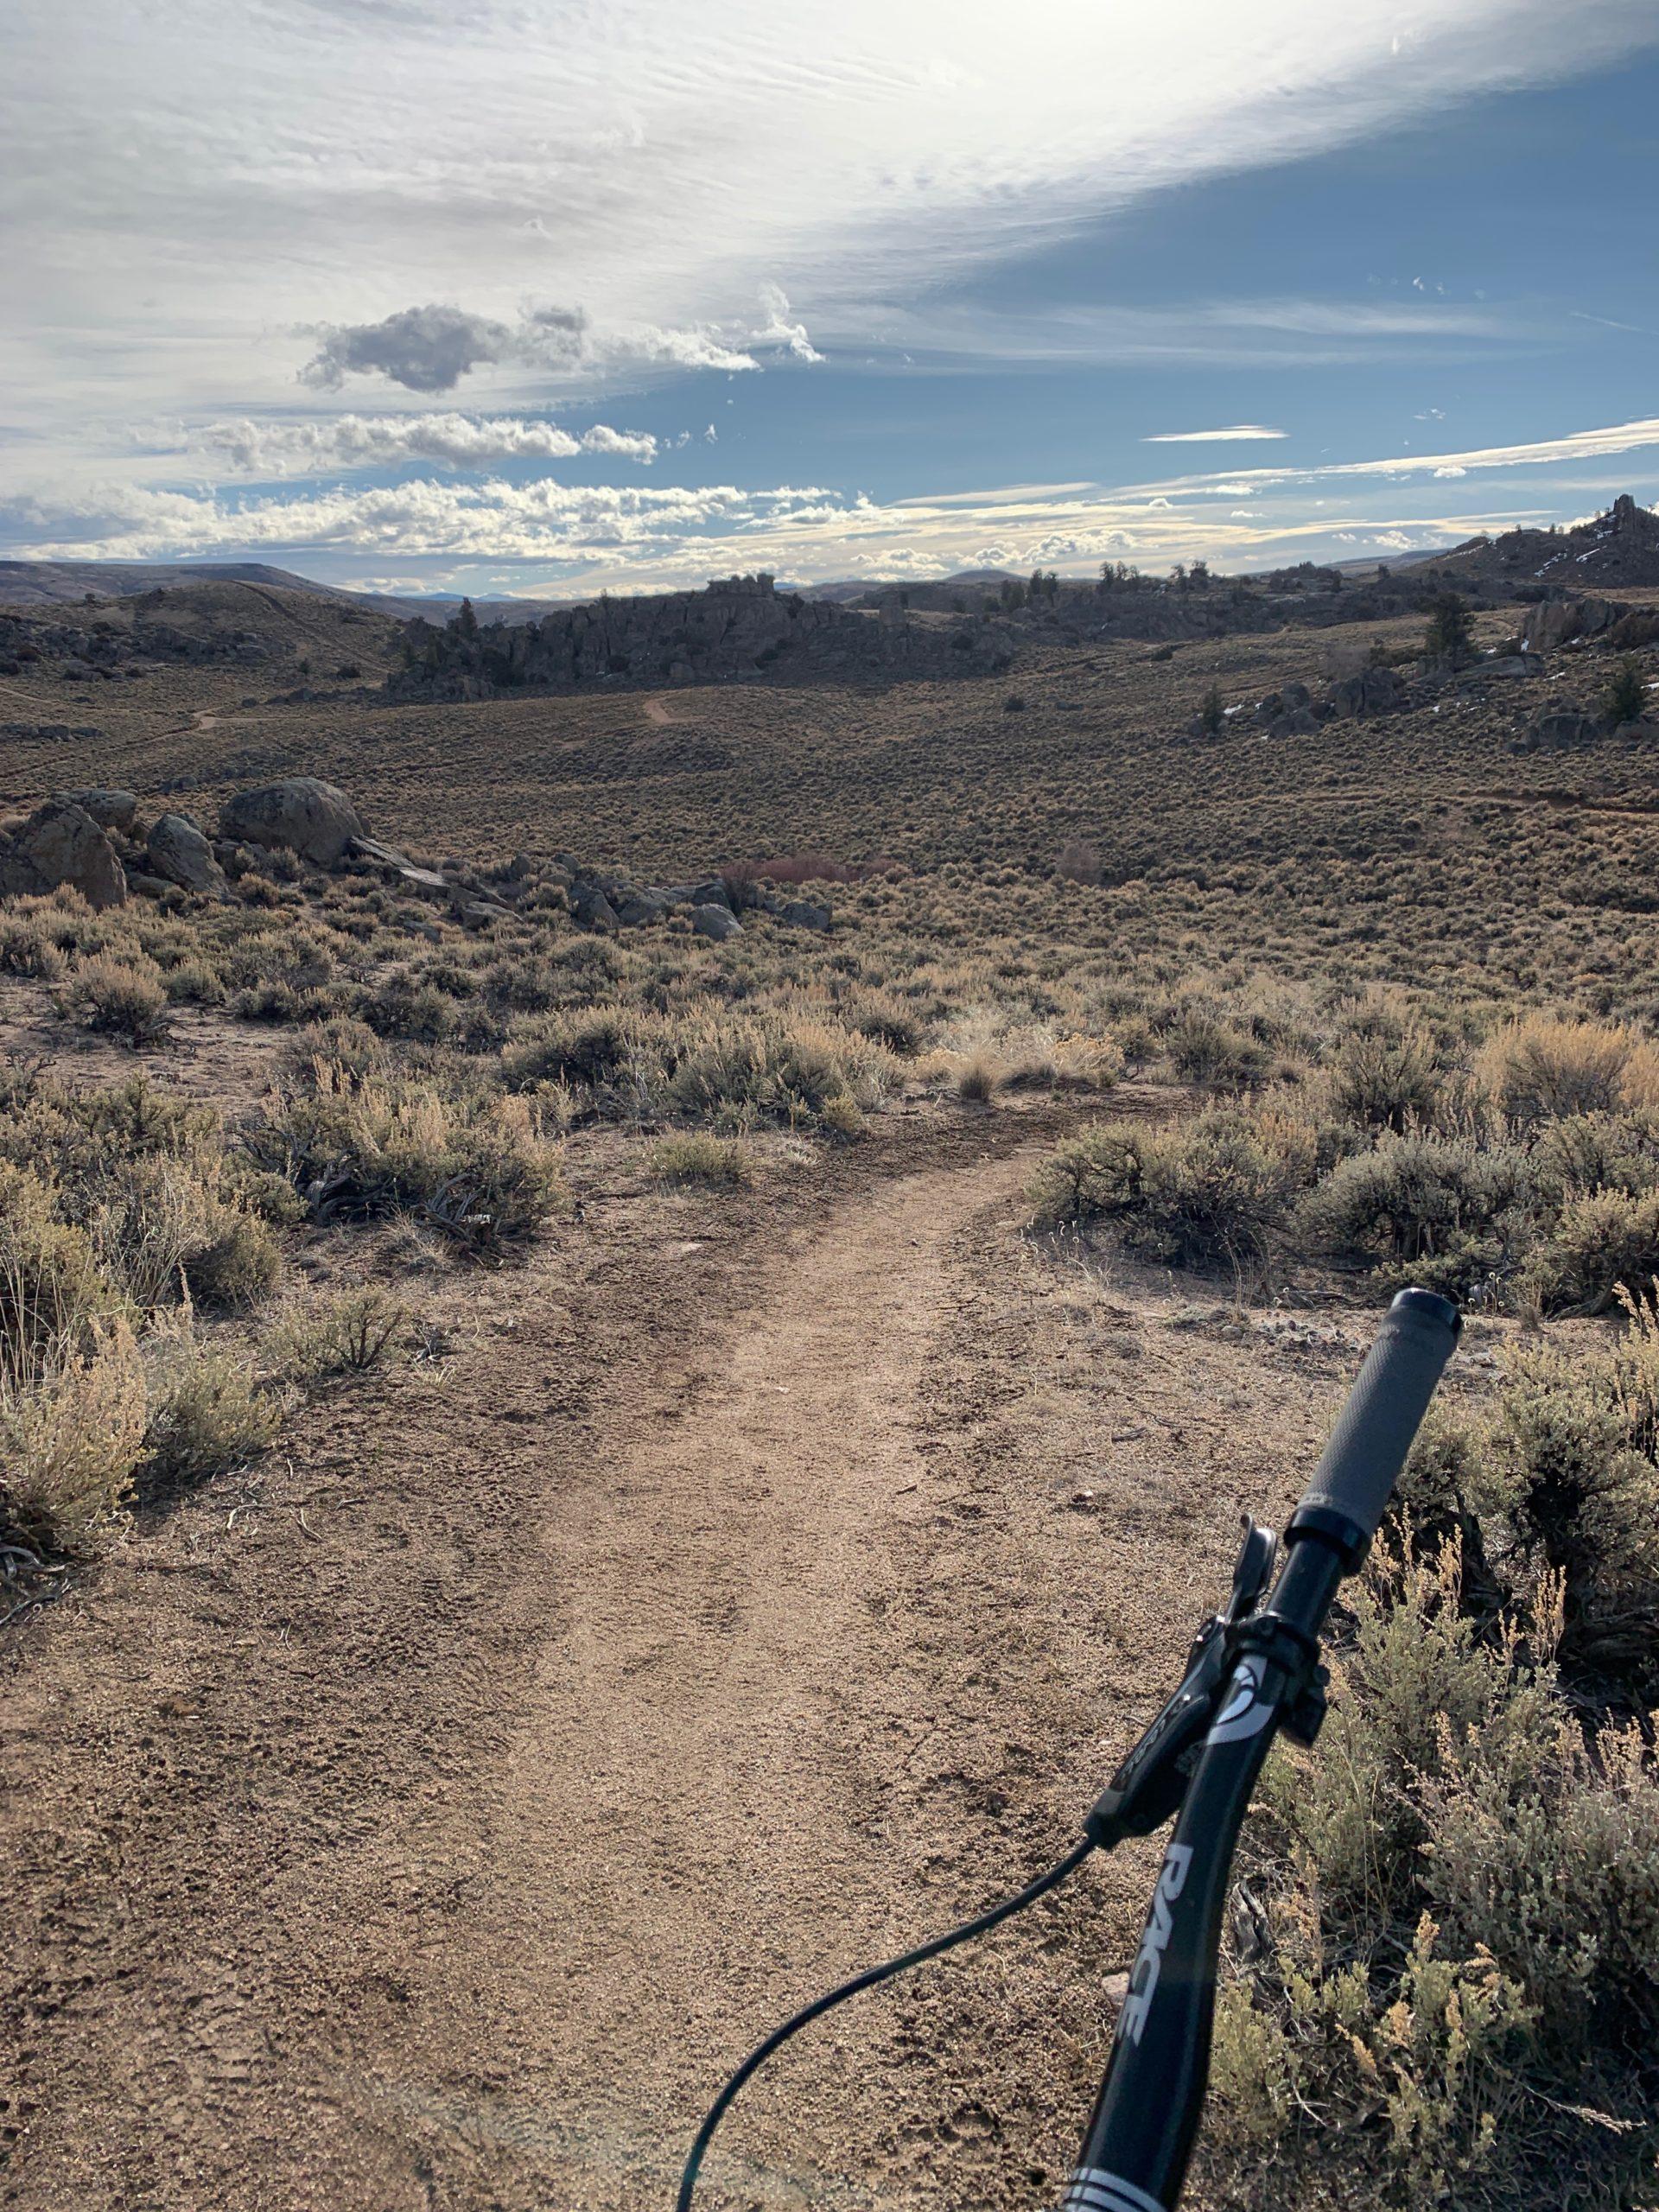 Trails at Hartman Rocks OPEN! Roads remain closed.